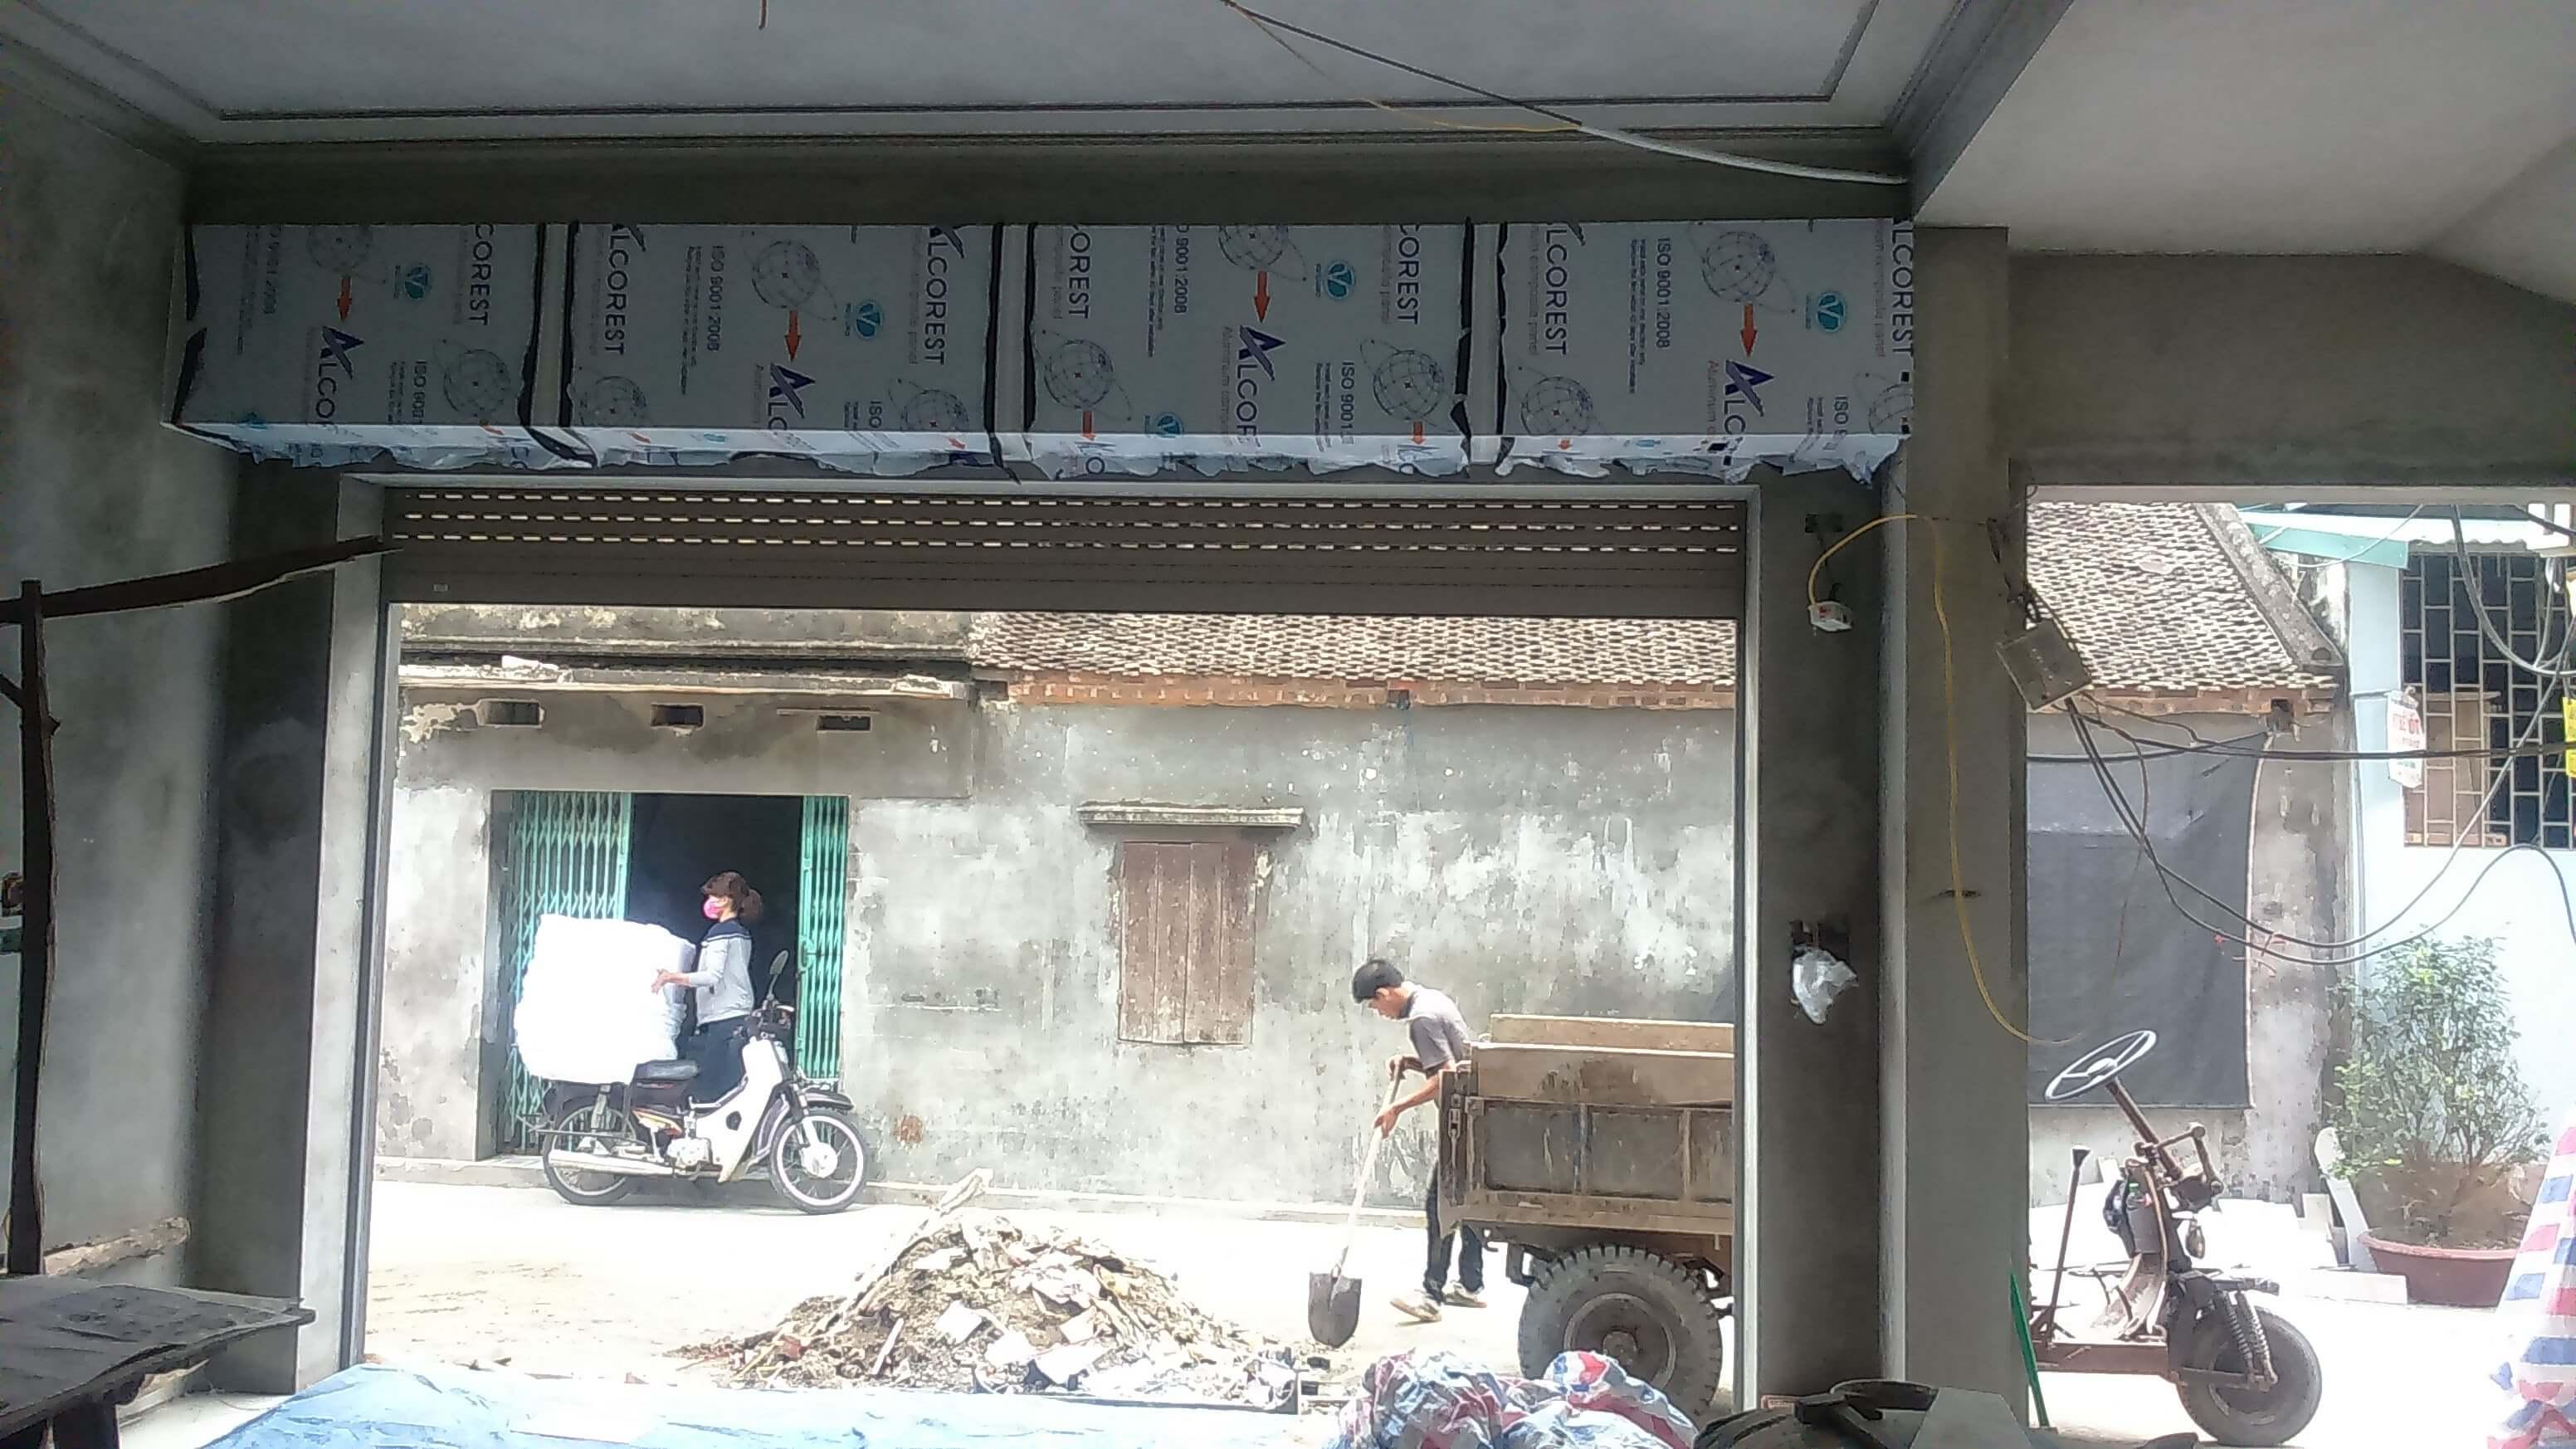 Sửa cửa cuốn phường 21 Quận Bình Thạnh